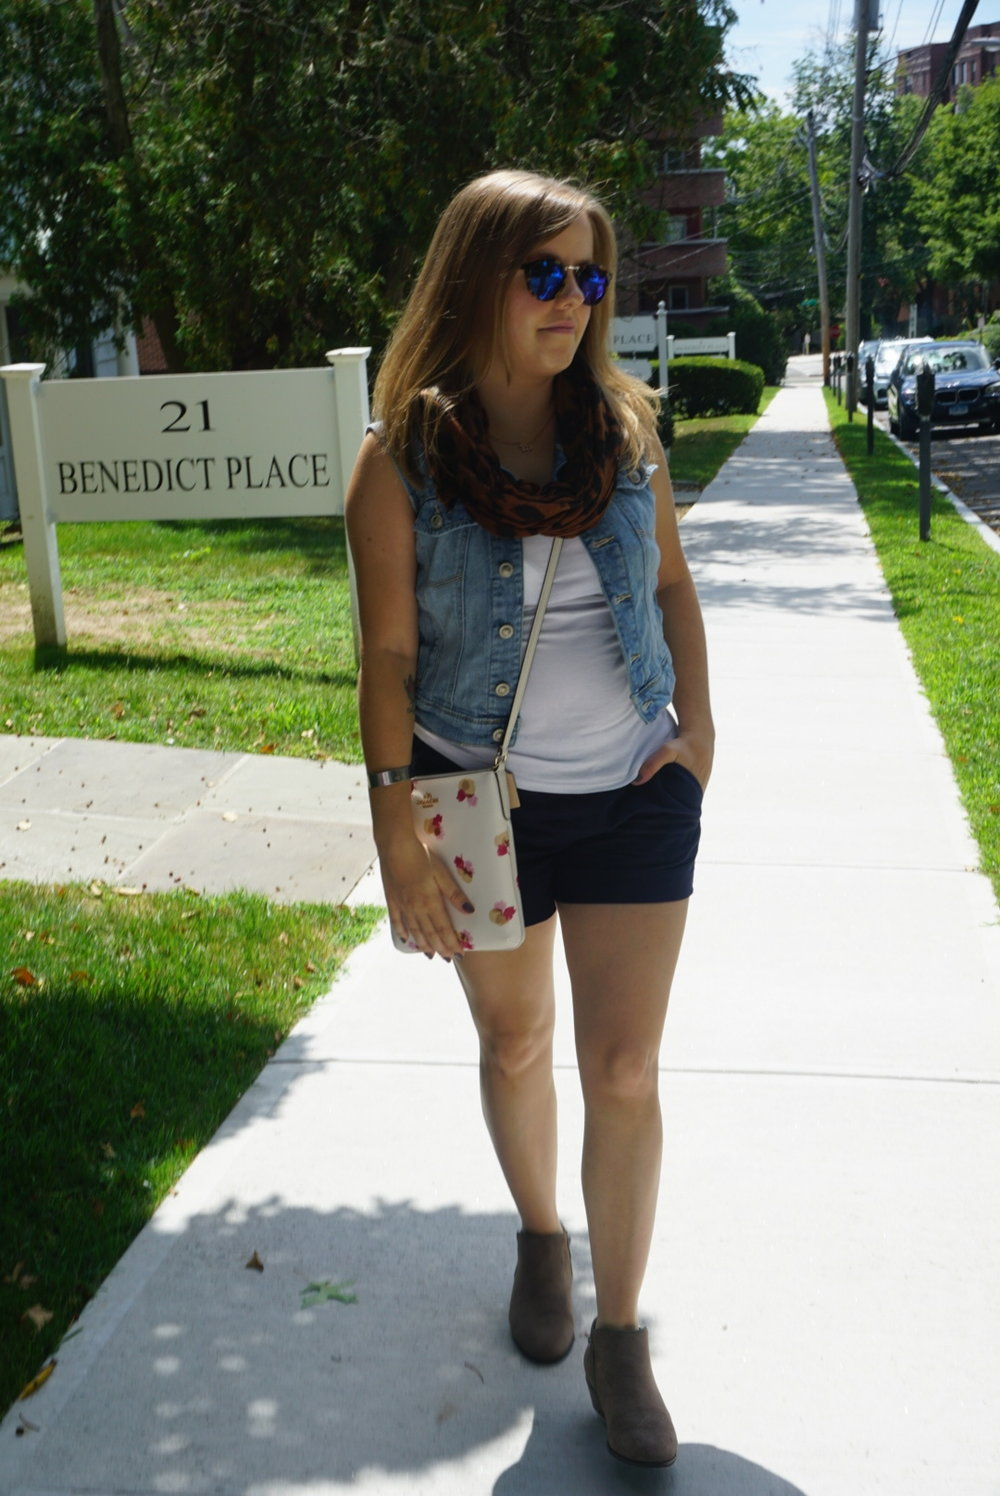 Shorts: JCrew, Denim Vest: Lauren Conrad for Kohls, Shoes: Crown Vintage, Accessories: Bag-Coach, Sunglasses- Madewell, Scarf- DSW = $177 Total for Outfit